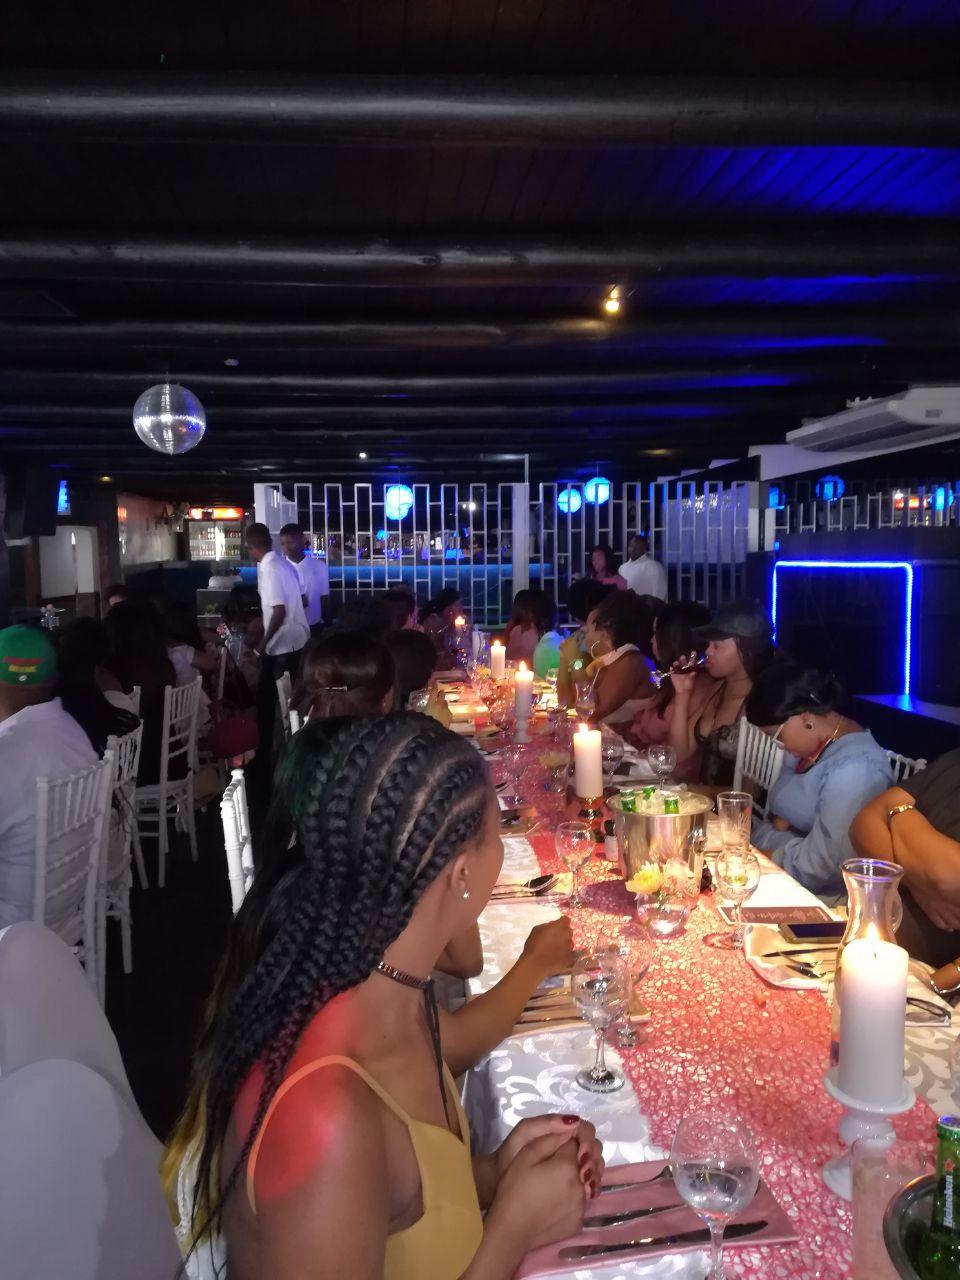 Night Club & Restuarant (Secunda)